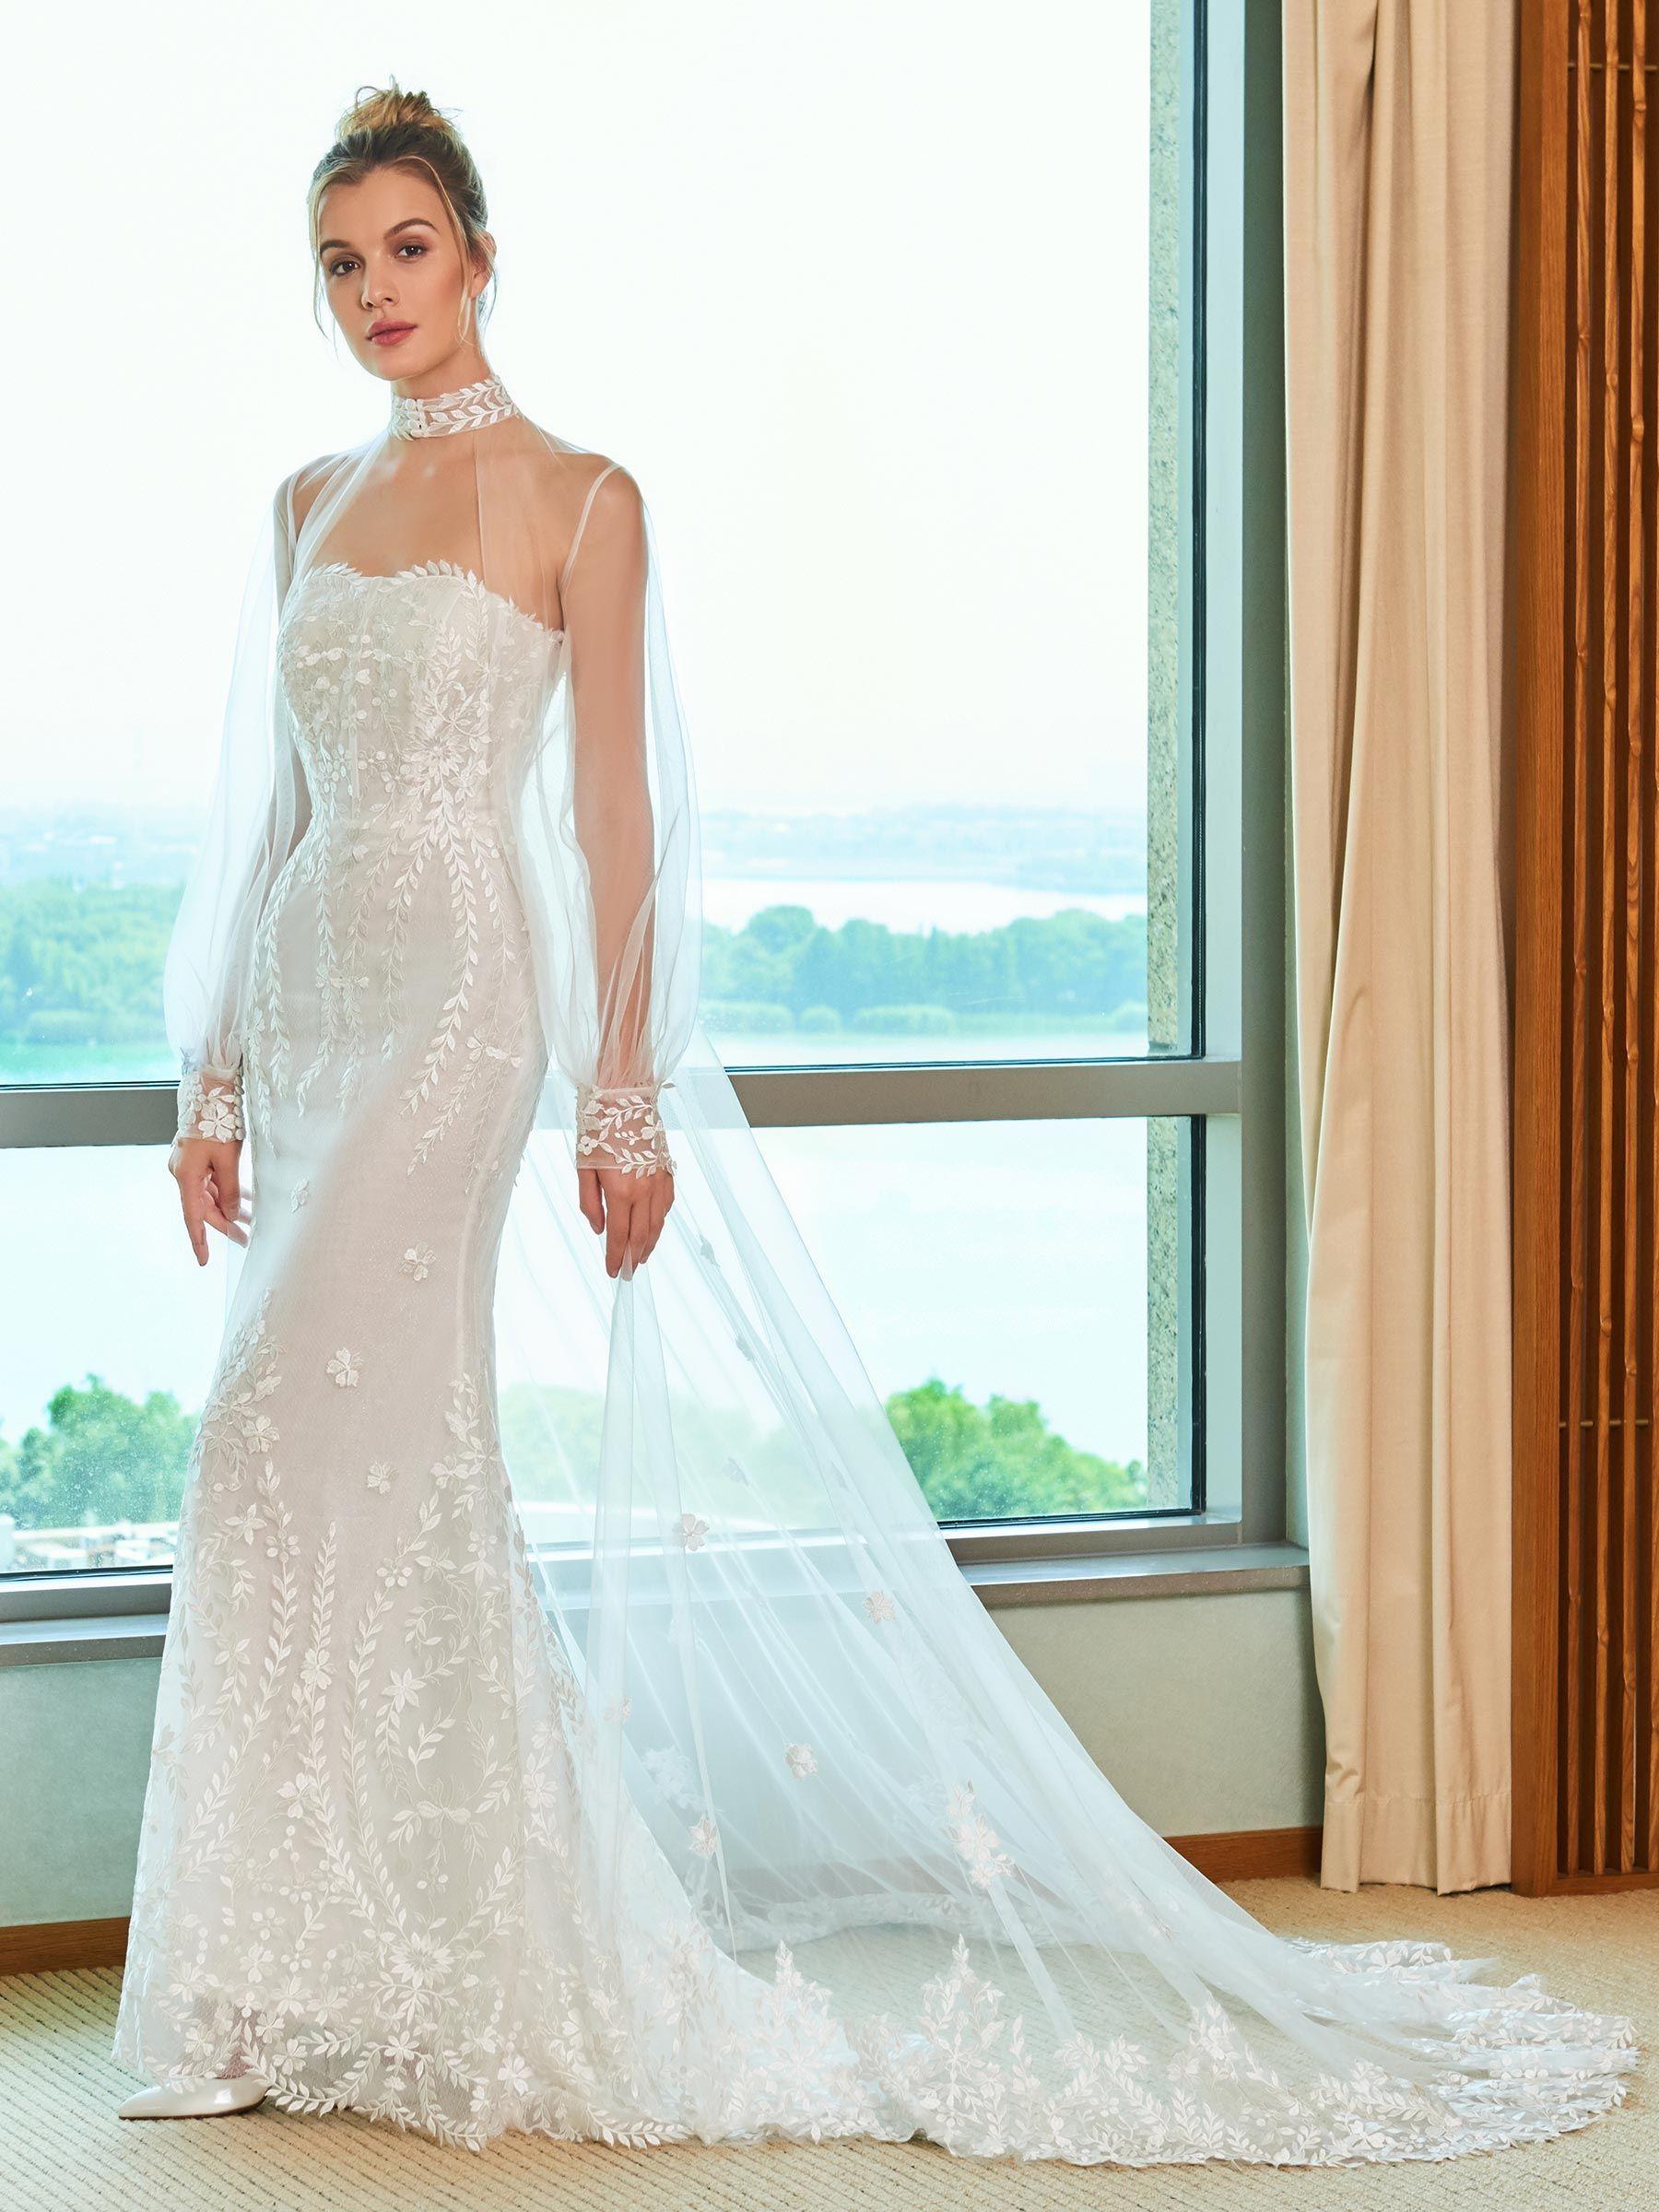 Mermaid lace wedding dress  Mermaid Lace Wedding Dress with Long Sleeve Jacket  Pinterest